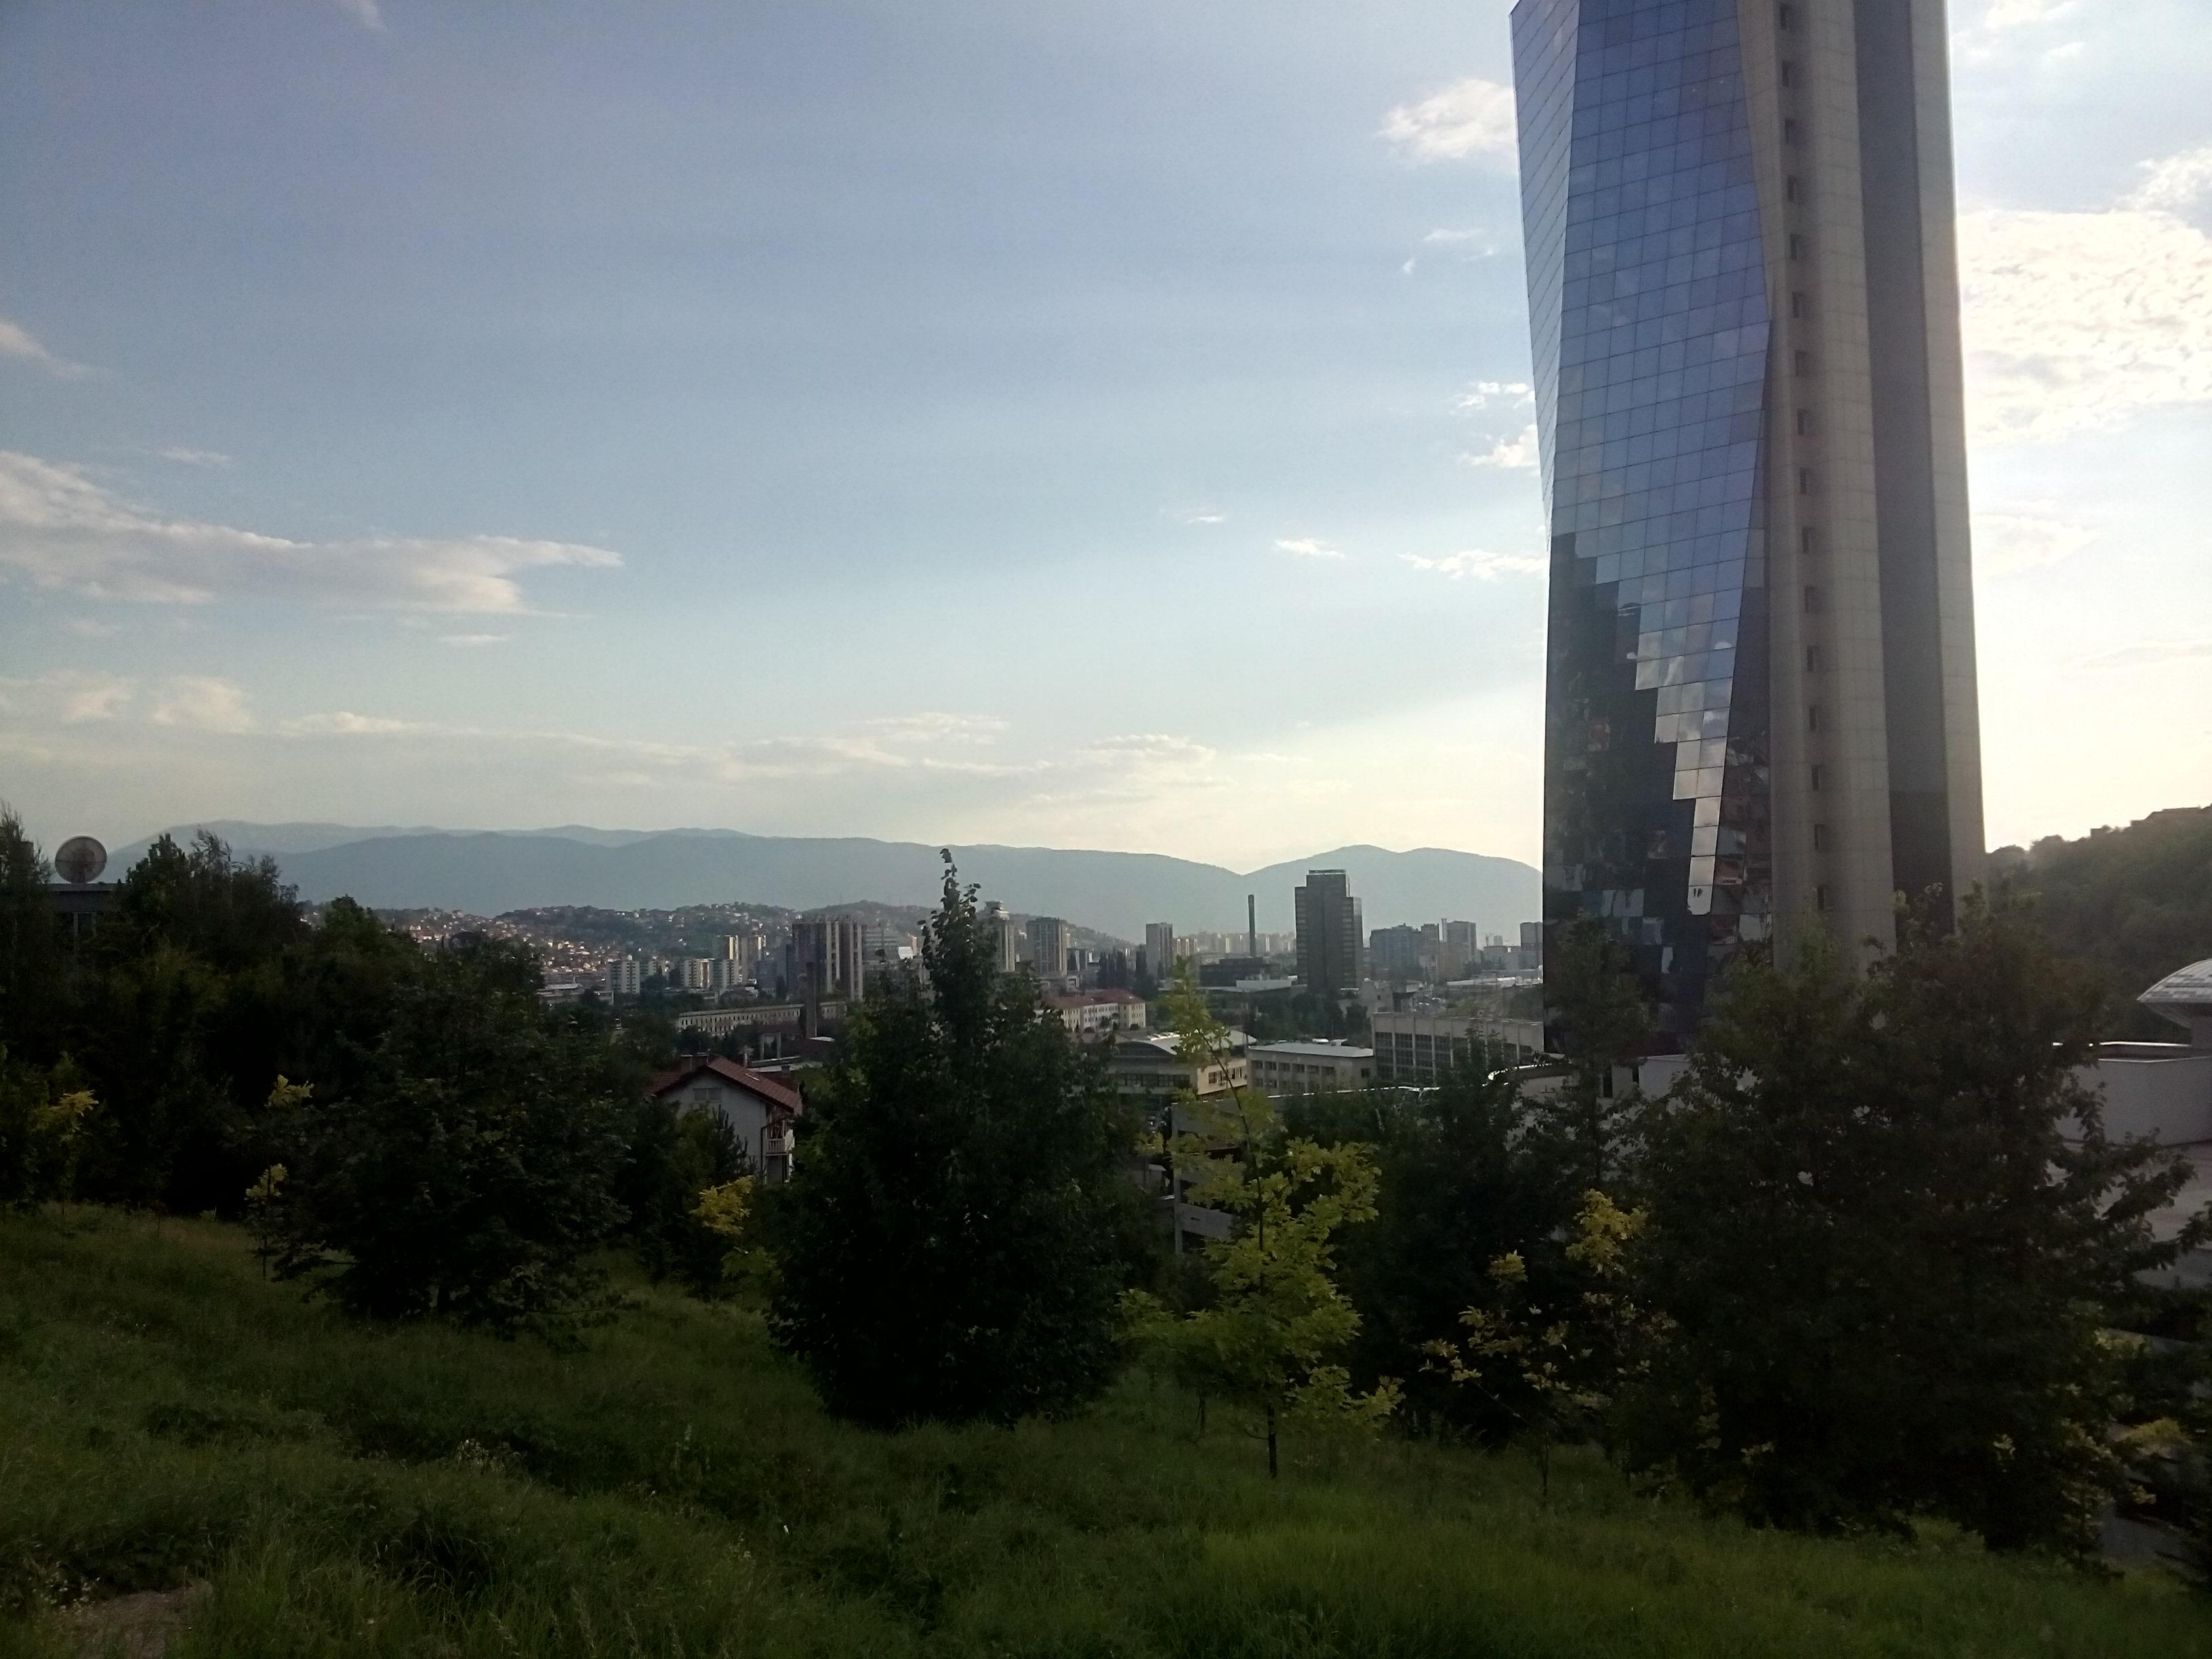 https://i.amy.gy/2017-sarajevo/IMG_20170707_190955_1.jpg